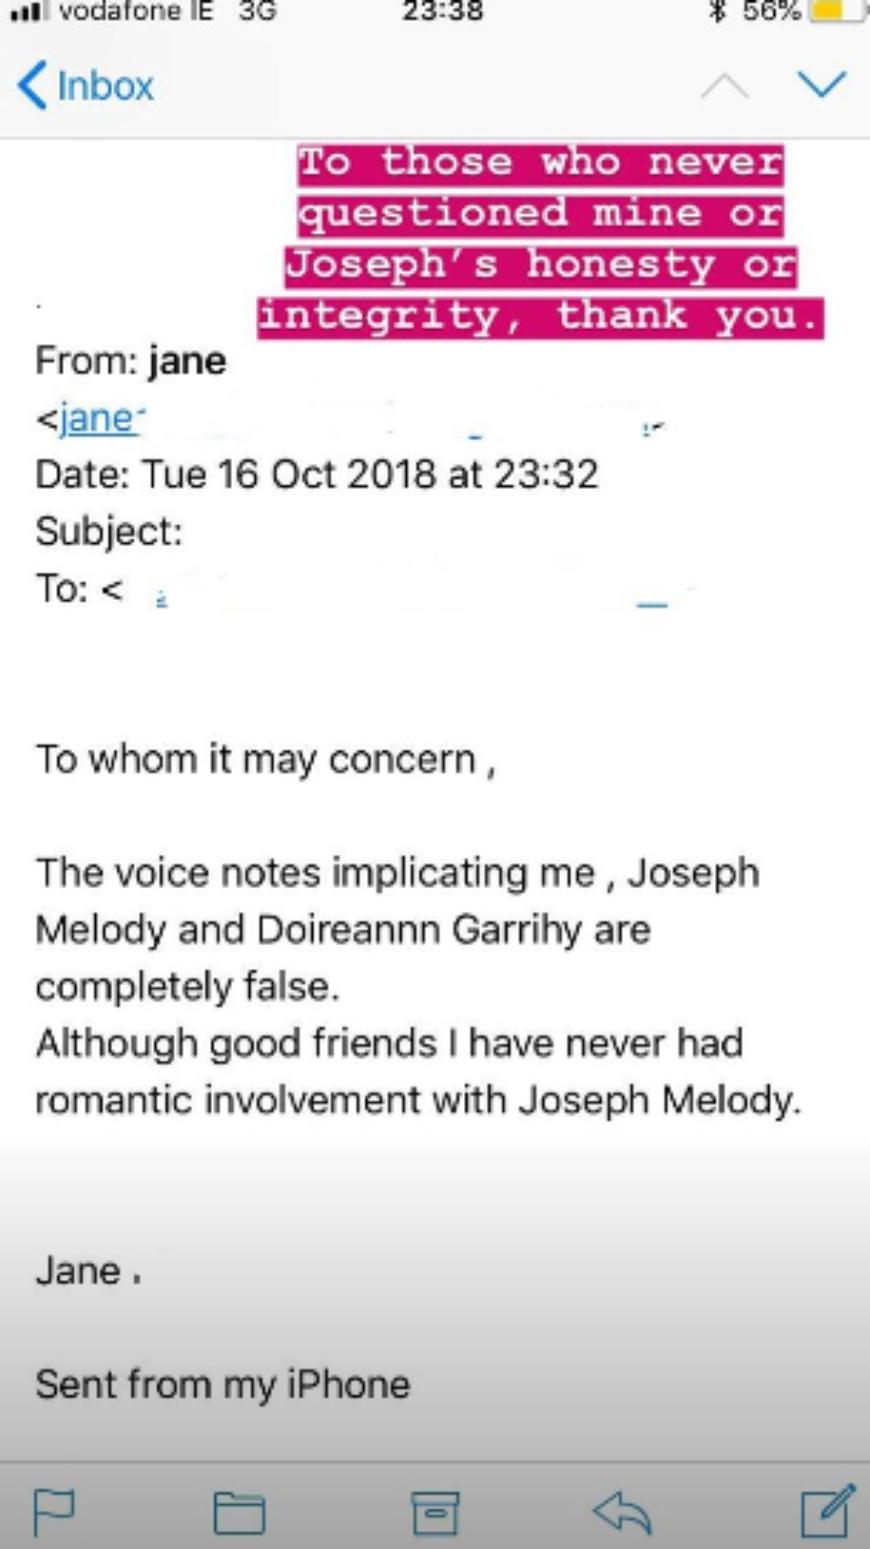 Doireann Garrihy Voice Notes 1